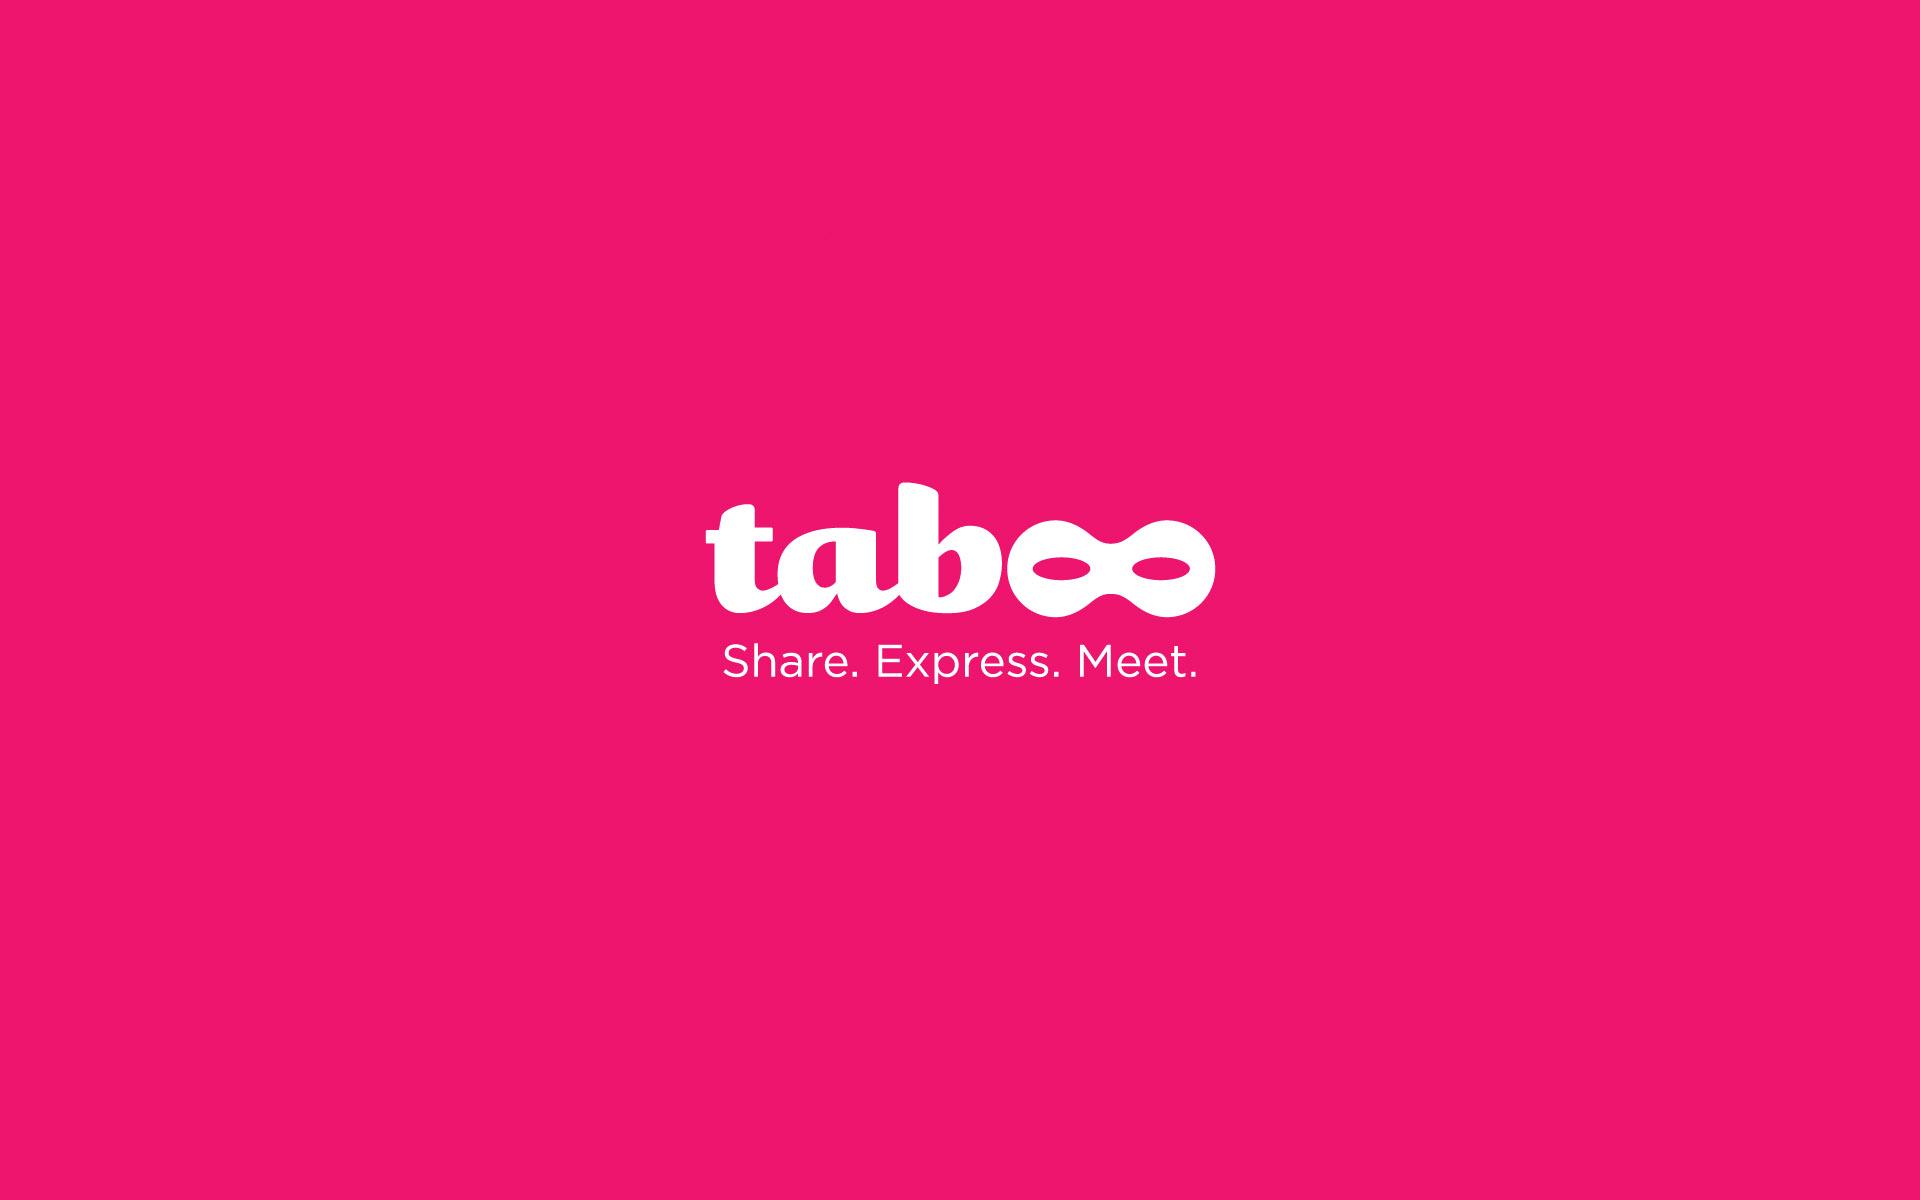 littlebrand-logo-taboo